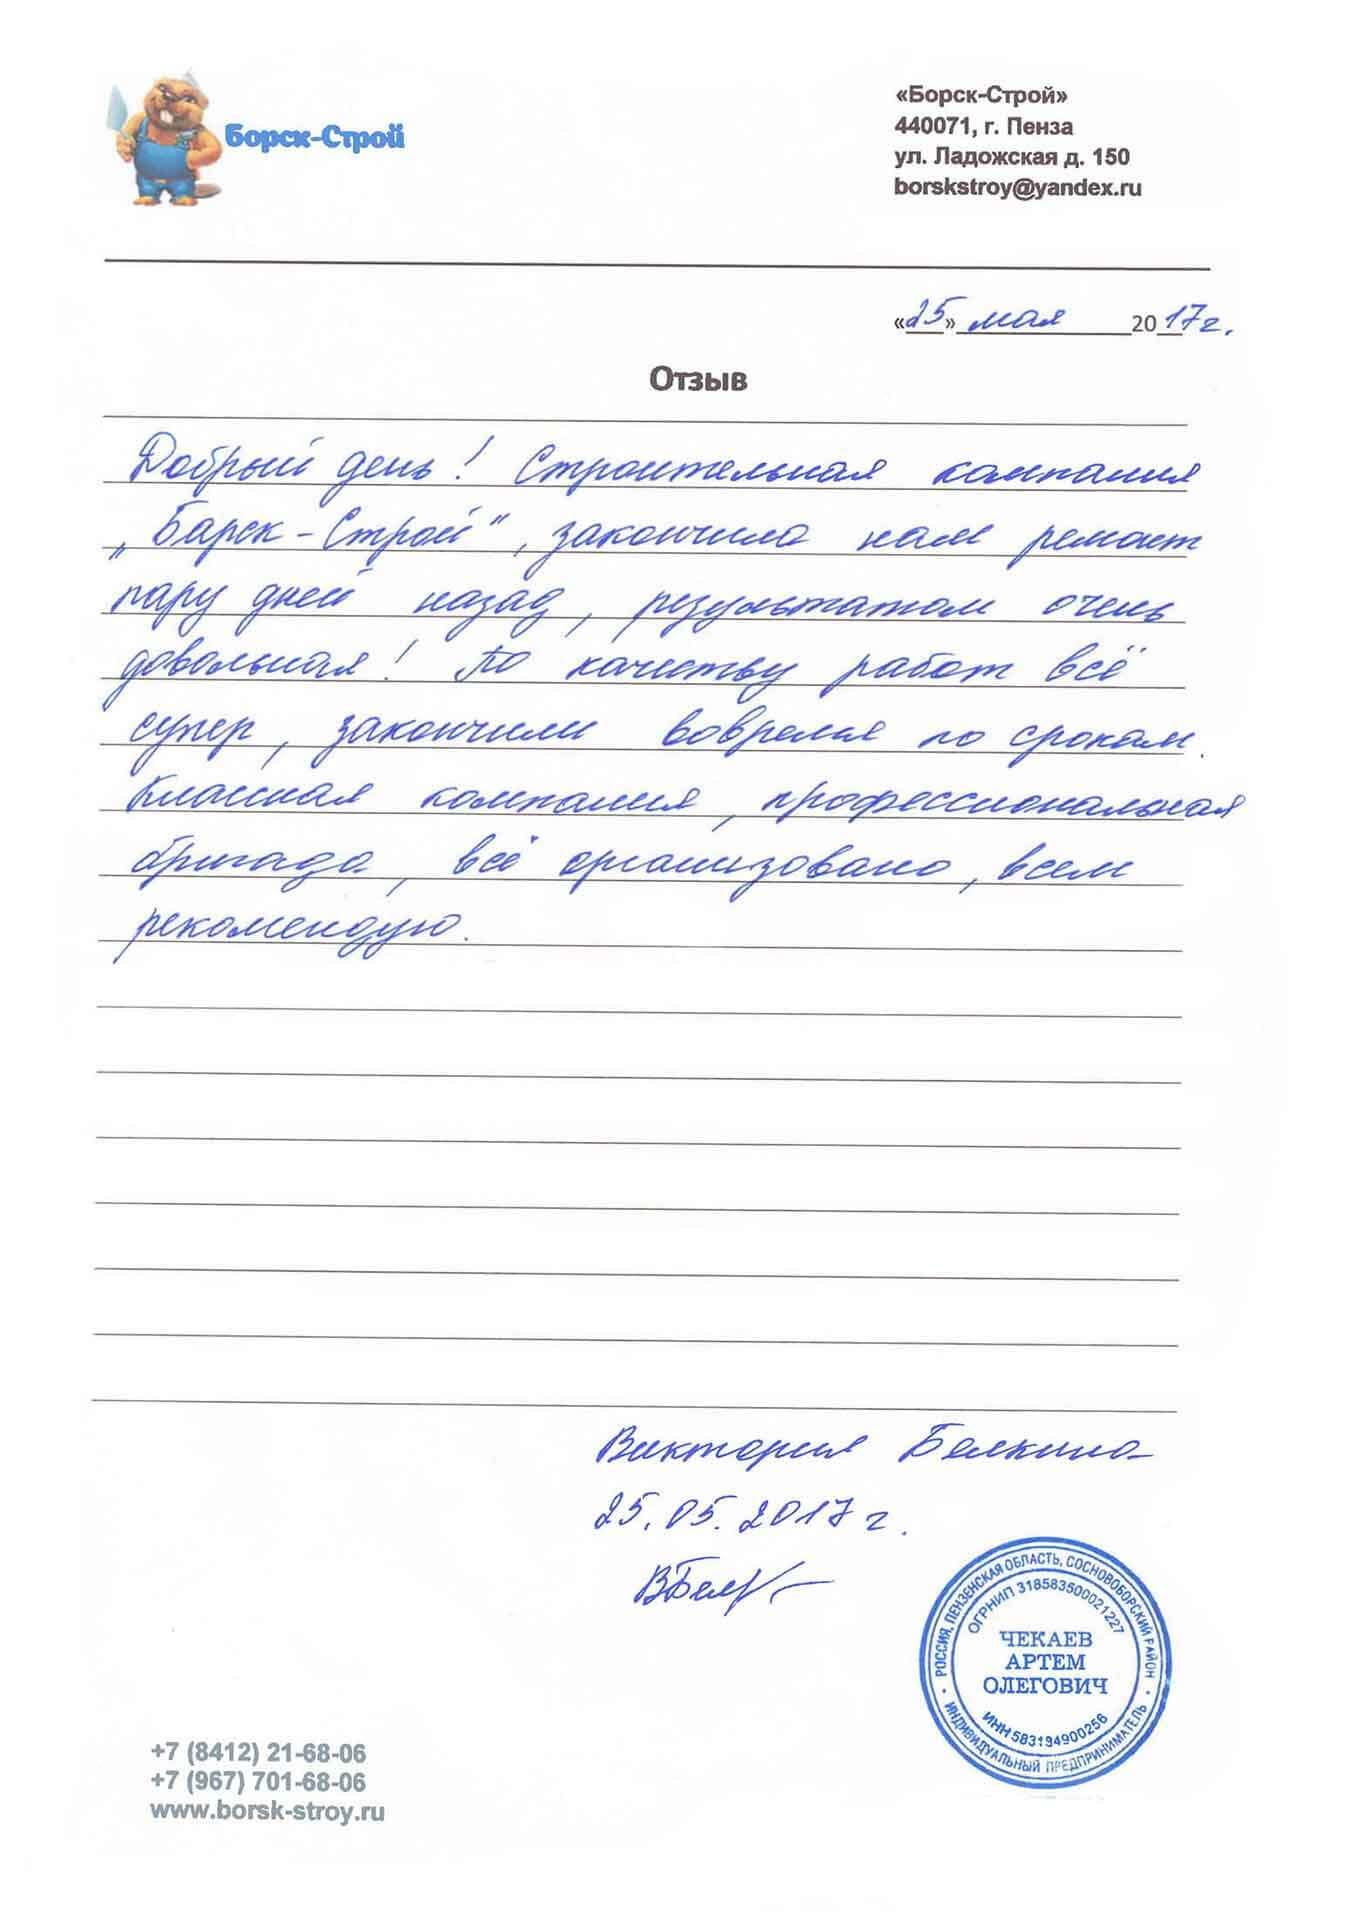 Виктория Белкина